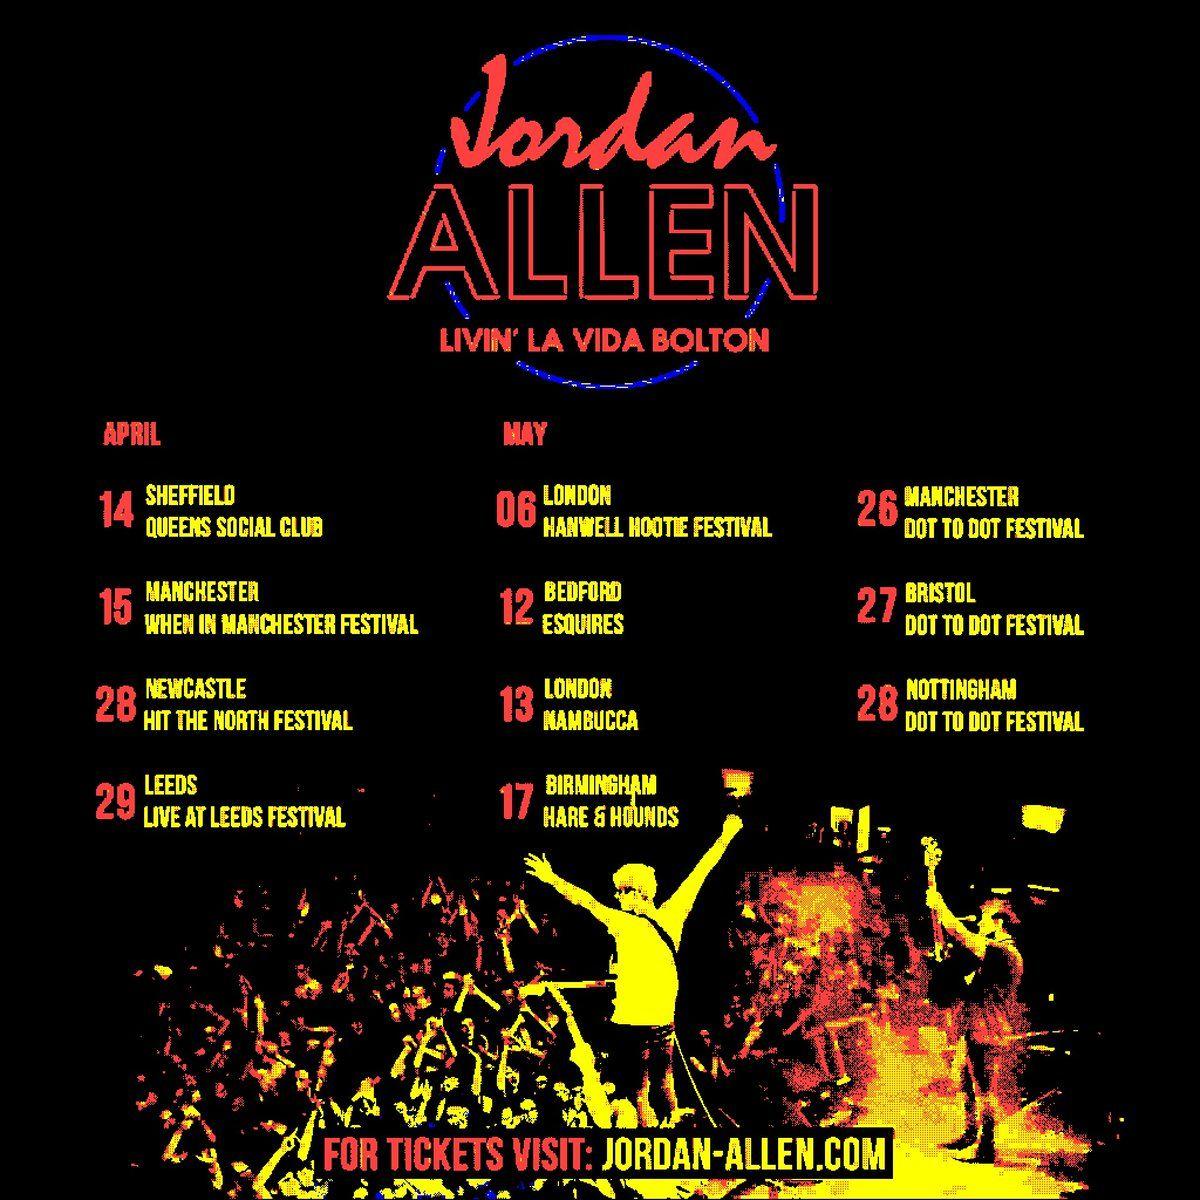 #JordanAllen @JordanAllenUK http://www.jordan-allen.com  pic.twitter.com/dkJNRIEMoH